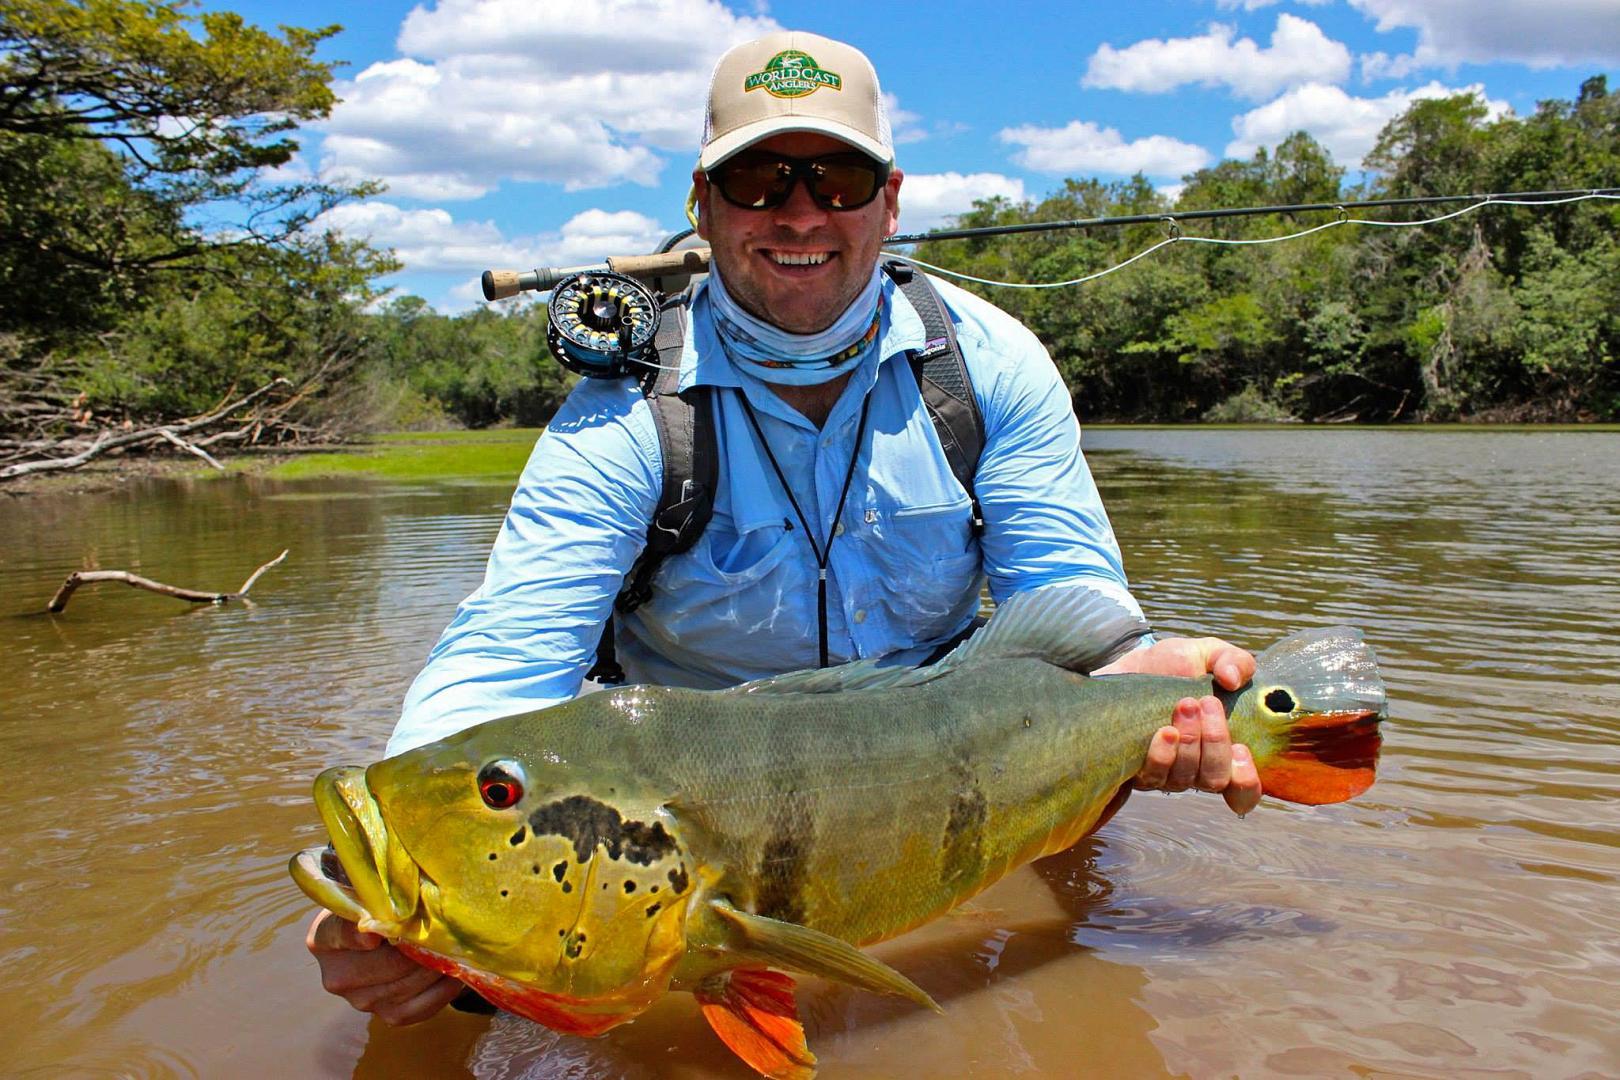 Peacock bass agua boa amazon lodge 2015 worldcast anglers for Fly girl fishing charters